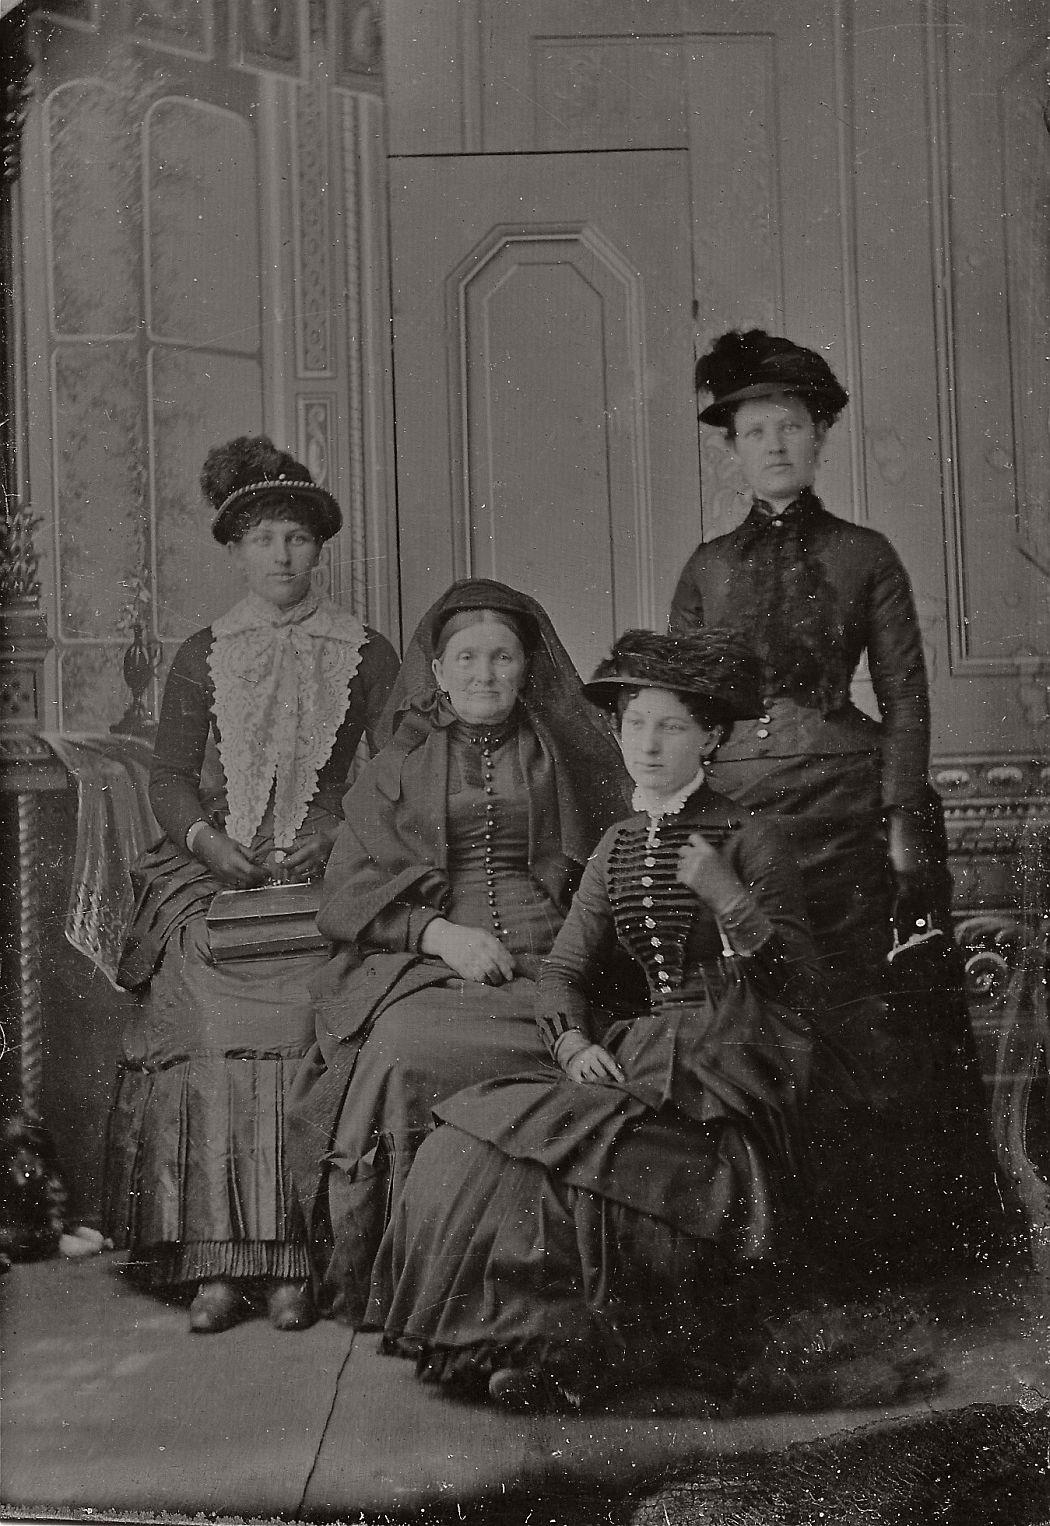 vintage-daguerreotypes-of-widows-in-mourning-victorian-era-1800s-37